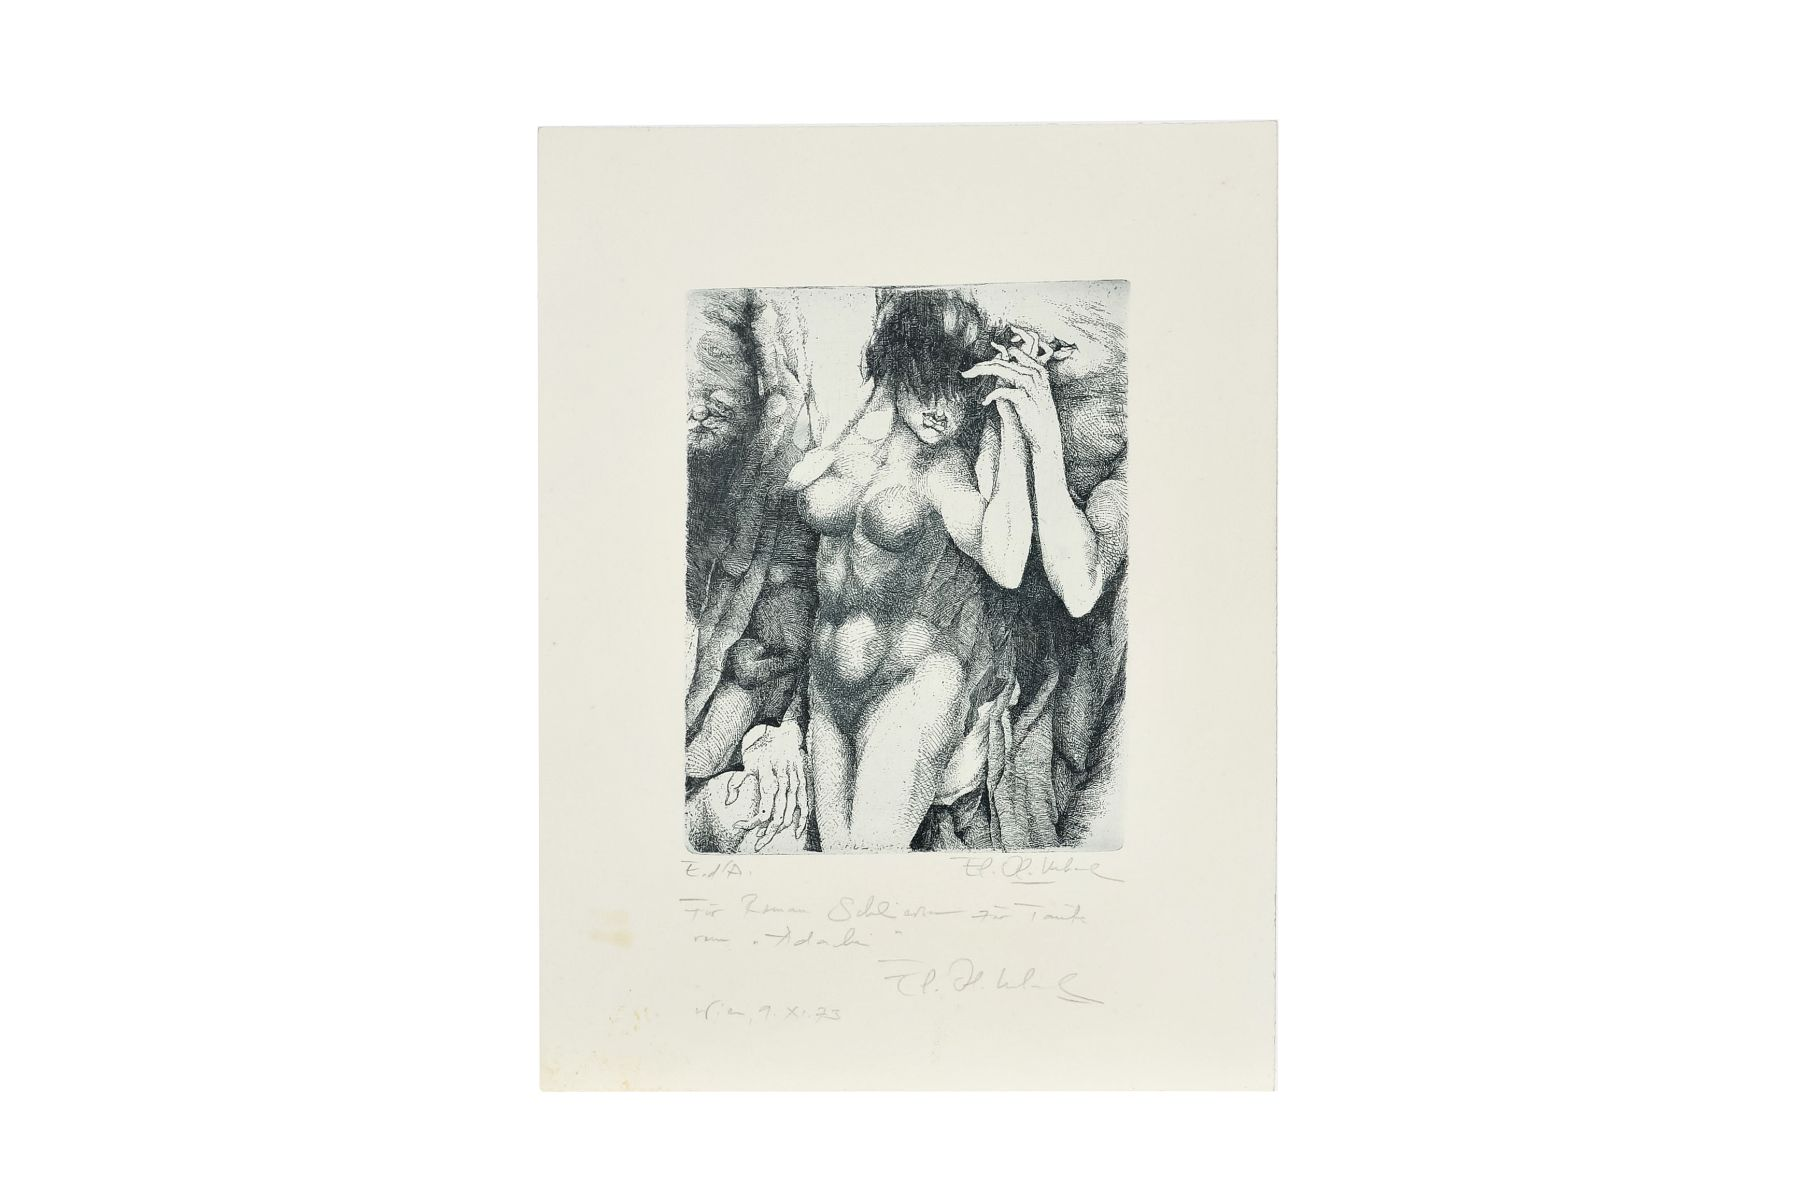 "#85 Artist of the 20 th century ""Untitled"" | Leherb, auch Maître Leherb (* 14. März 1933 in Wien; † 28. Juni 1997 ebenda), ""Ohne Titel"" Image"